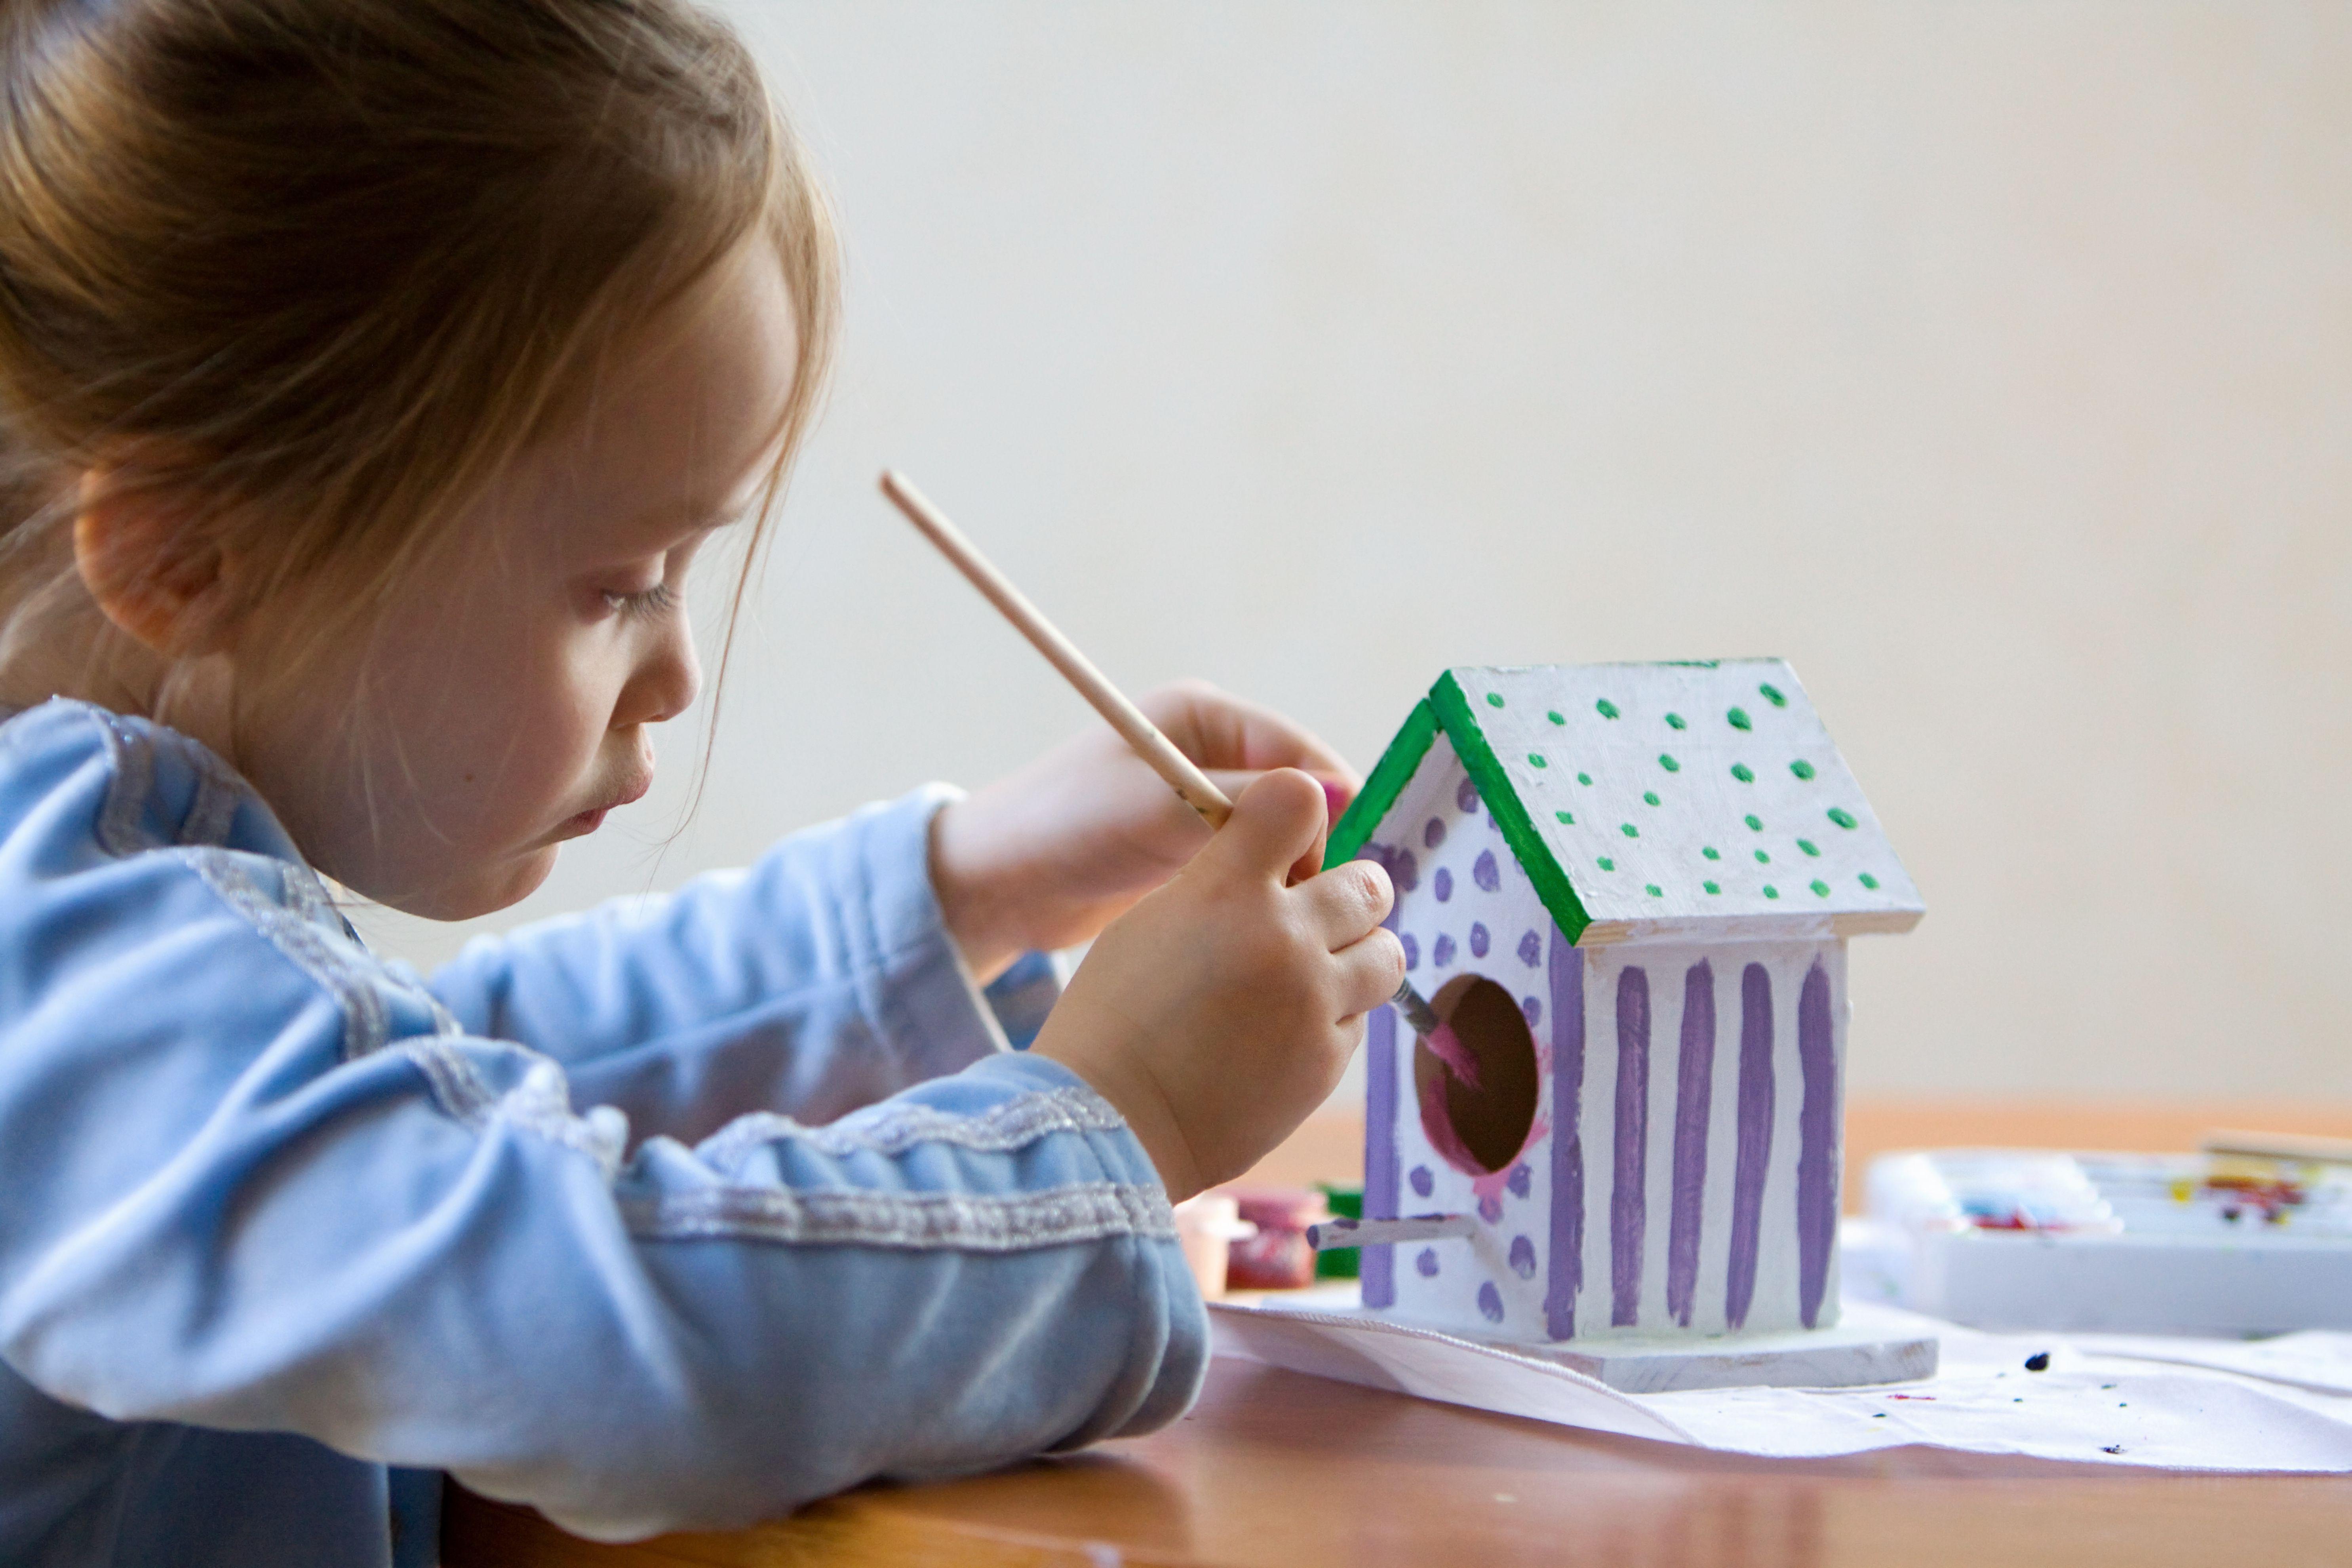 Little girl painting wooden birdhouse